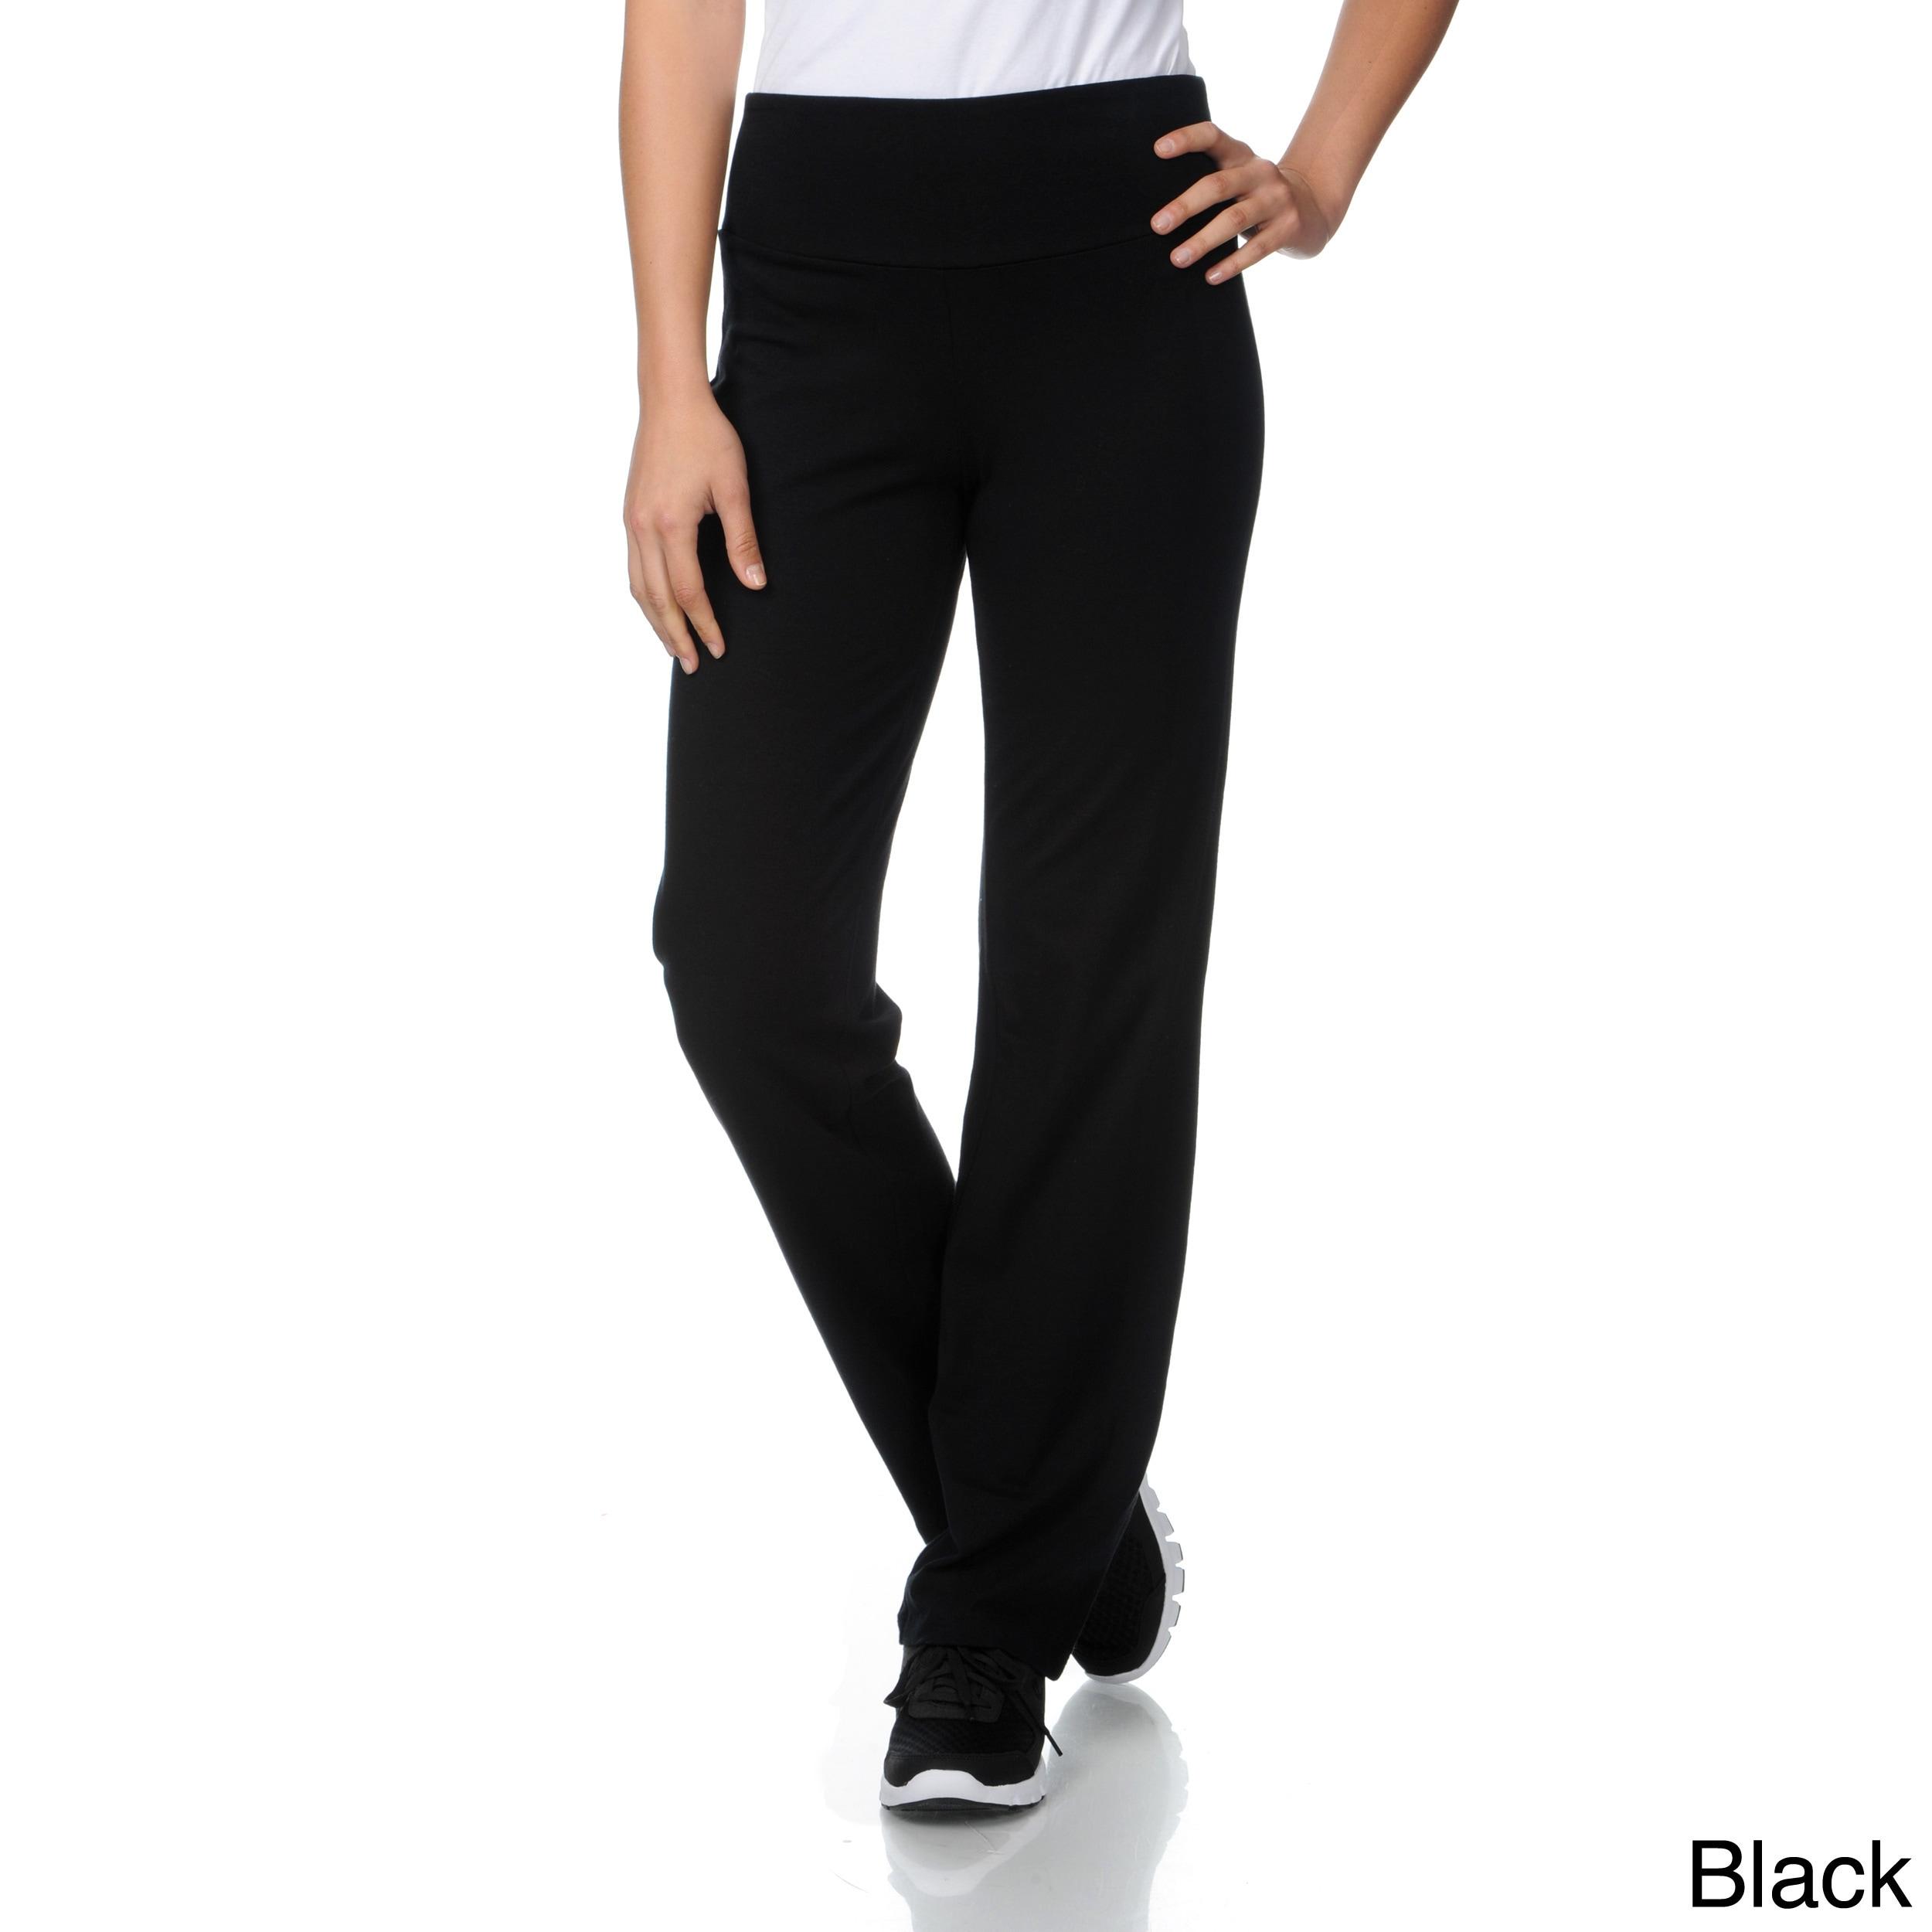 Teez-Her Teez-Her Women's Pull-On Seamed Waist Skinny Pants